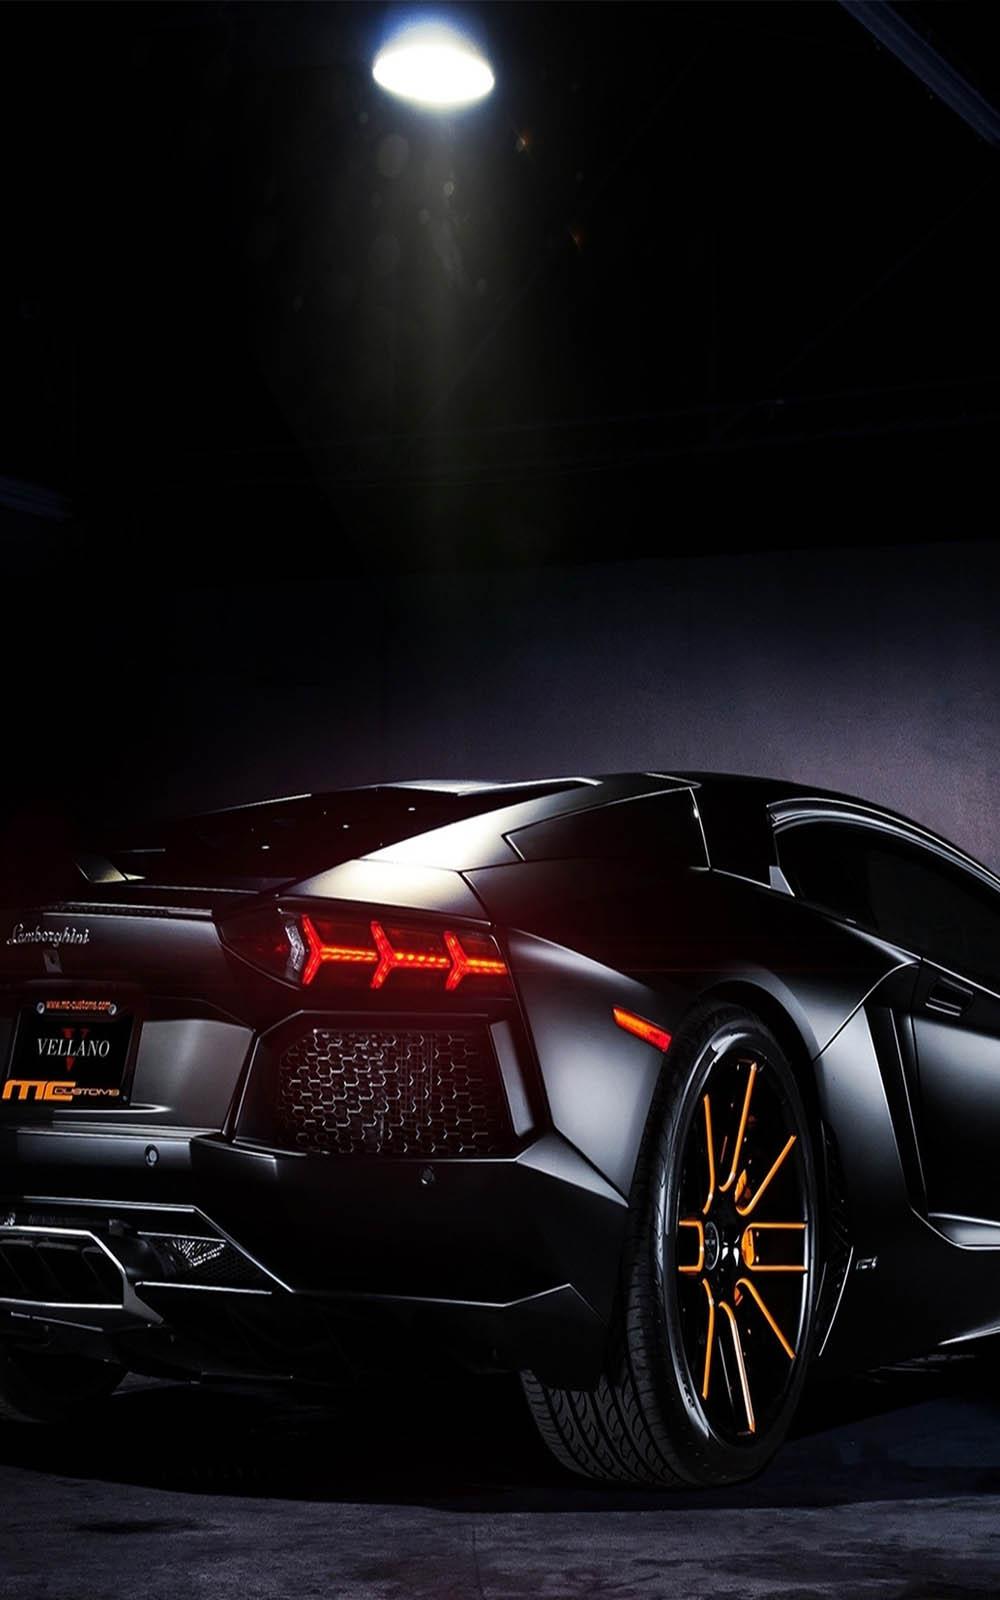 Lamborghini Black Shine Download Free Hd Mobile Wallpapers